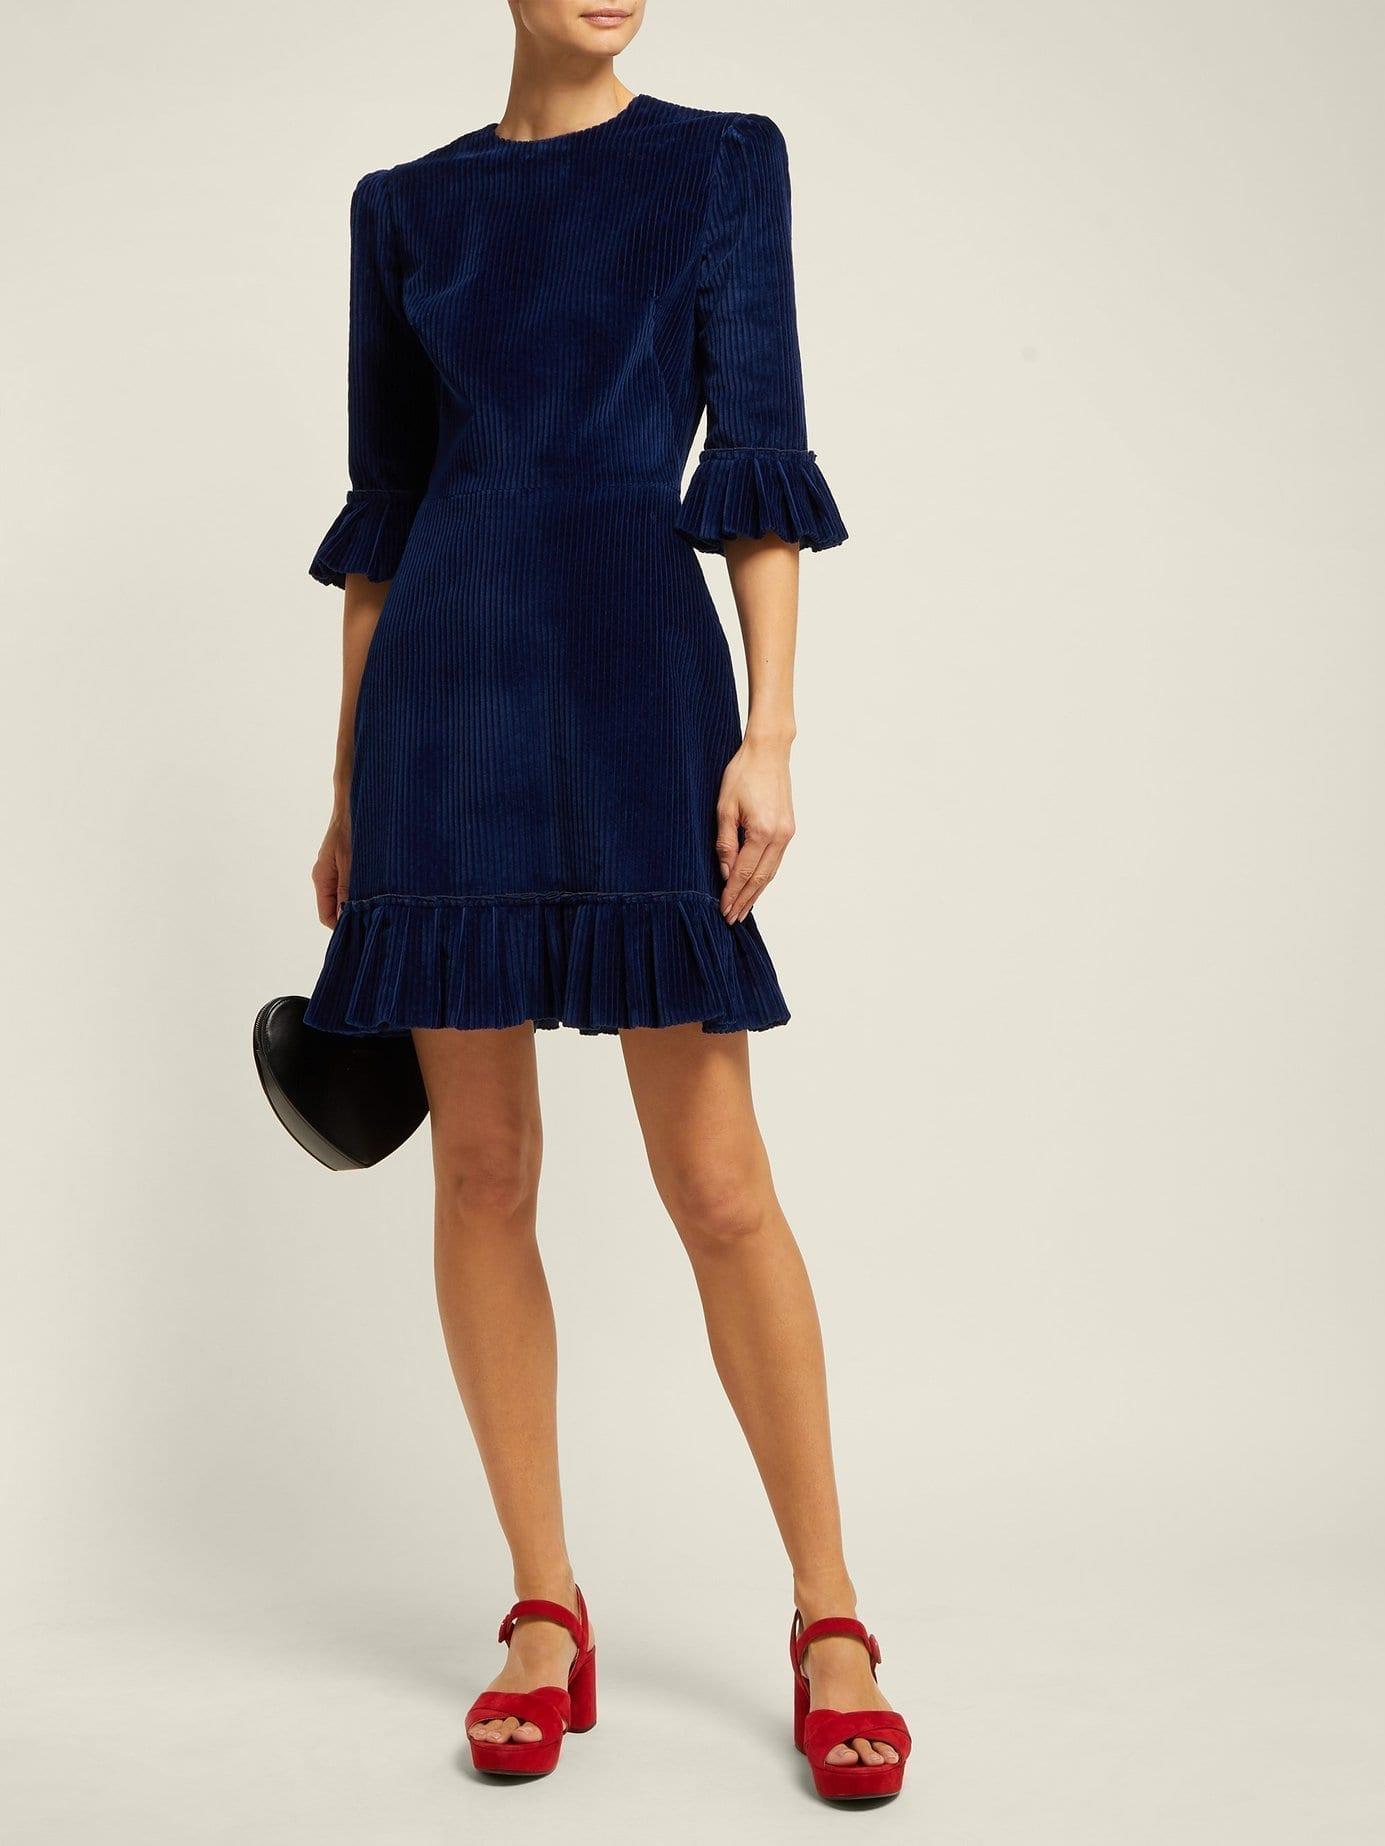 THE VAMPIRE'S WIFE Mini Festival Ruffled Corduroy Navy Dress